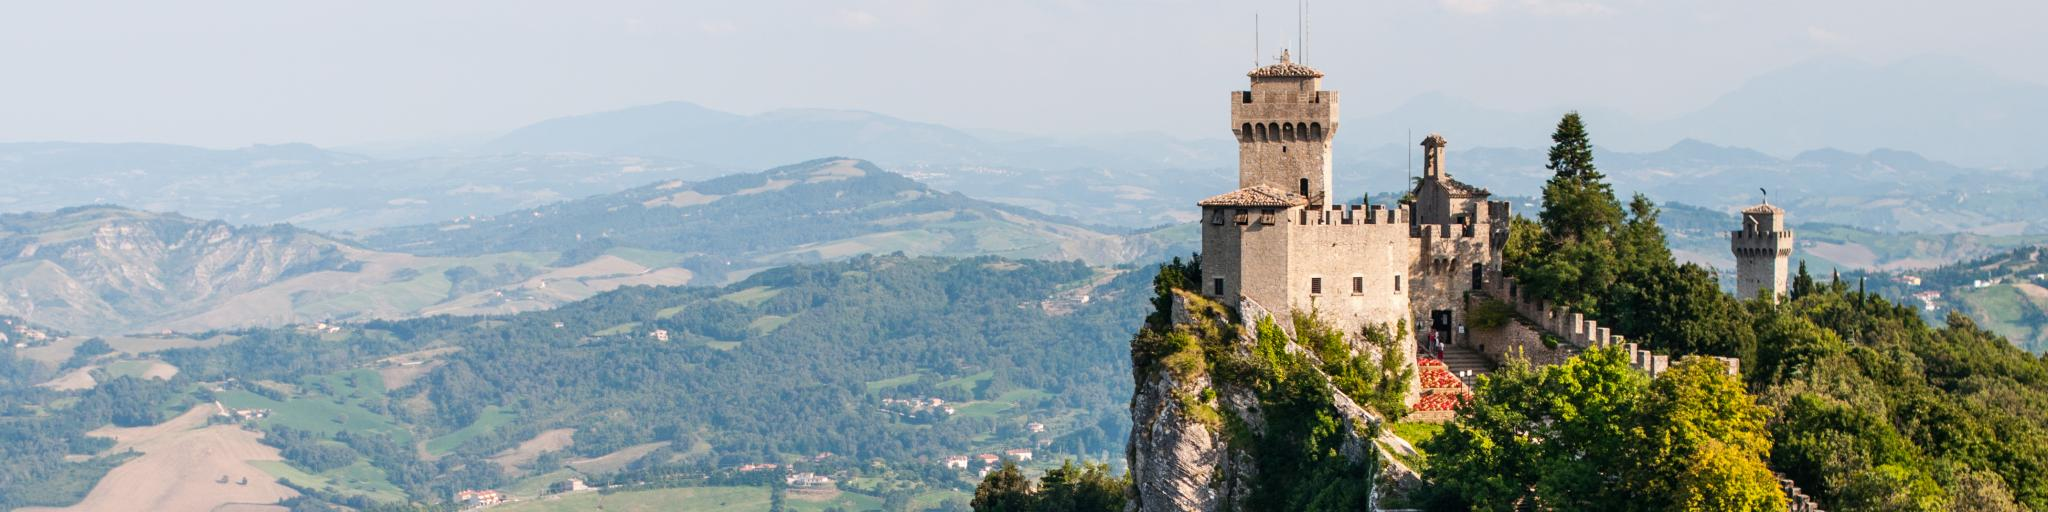 The 11th-century Guaita fortress sits on Monte Titano overlooking the city of San Marino